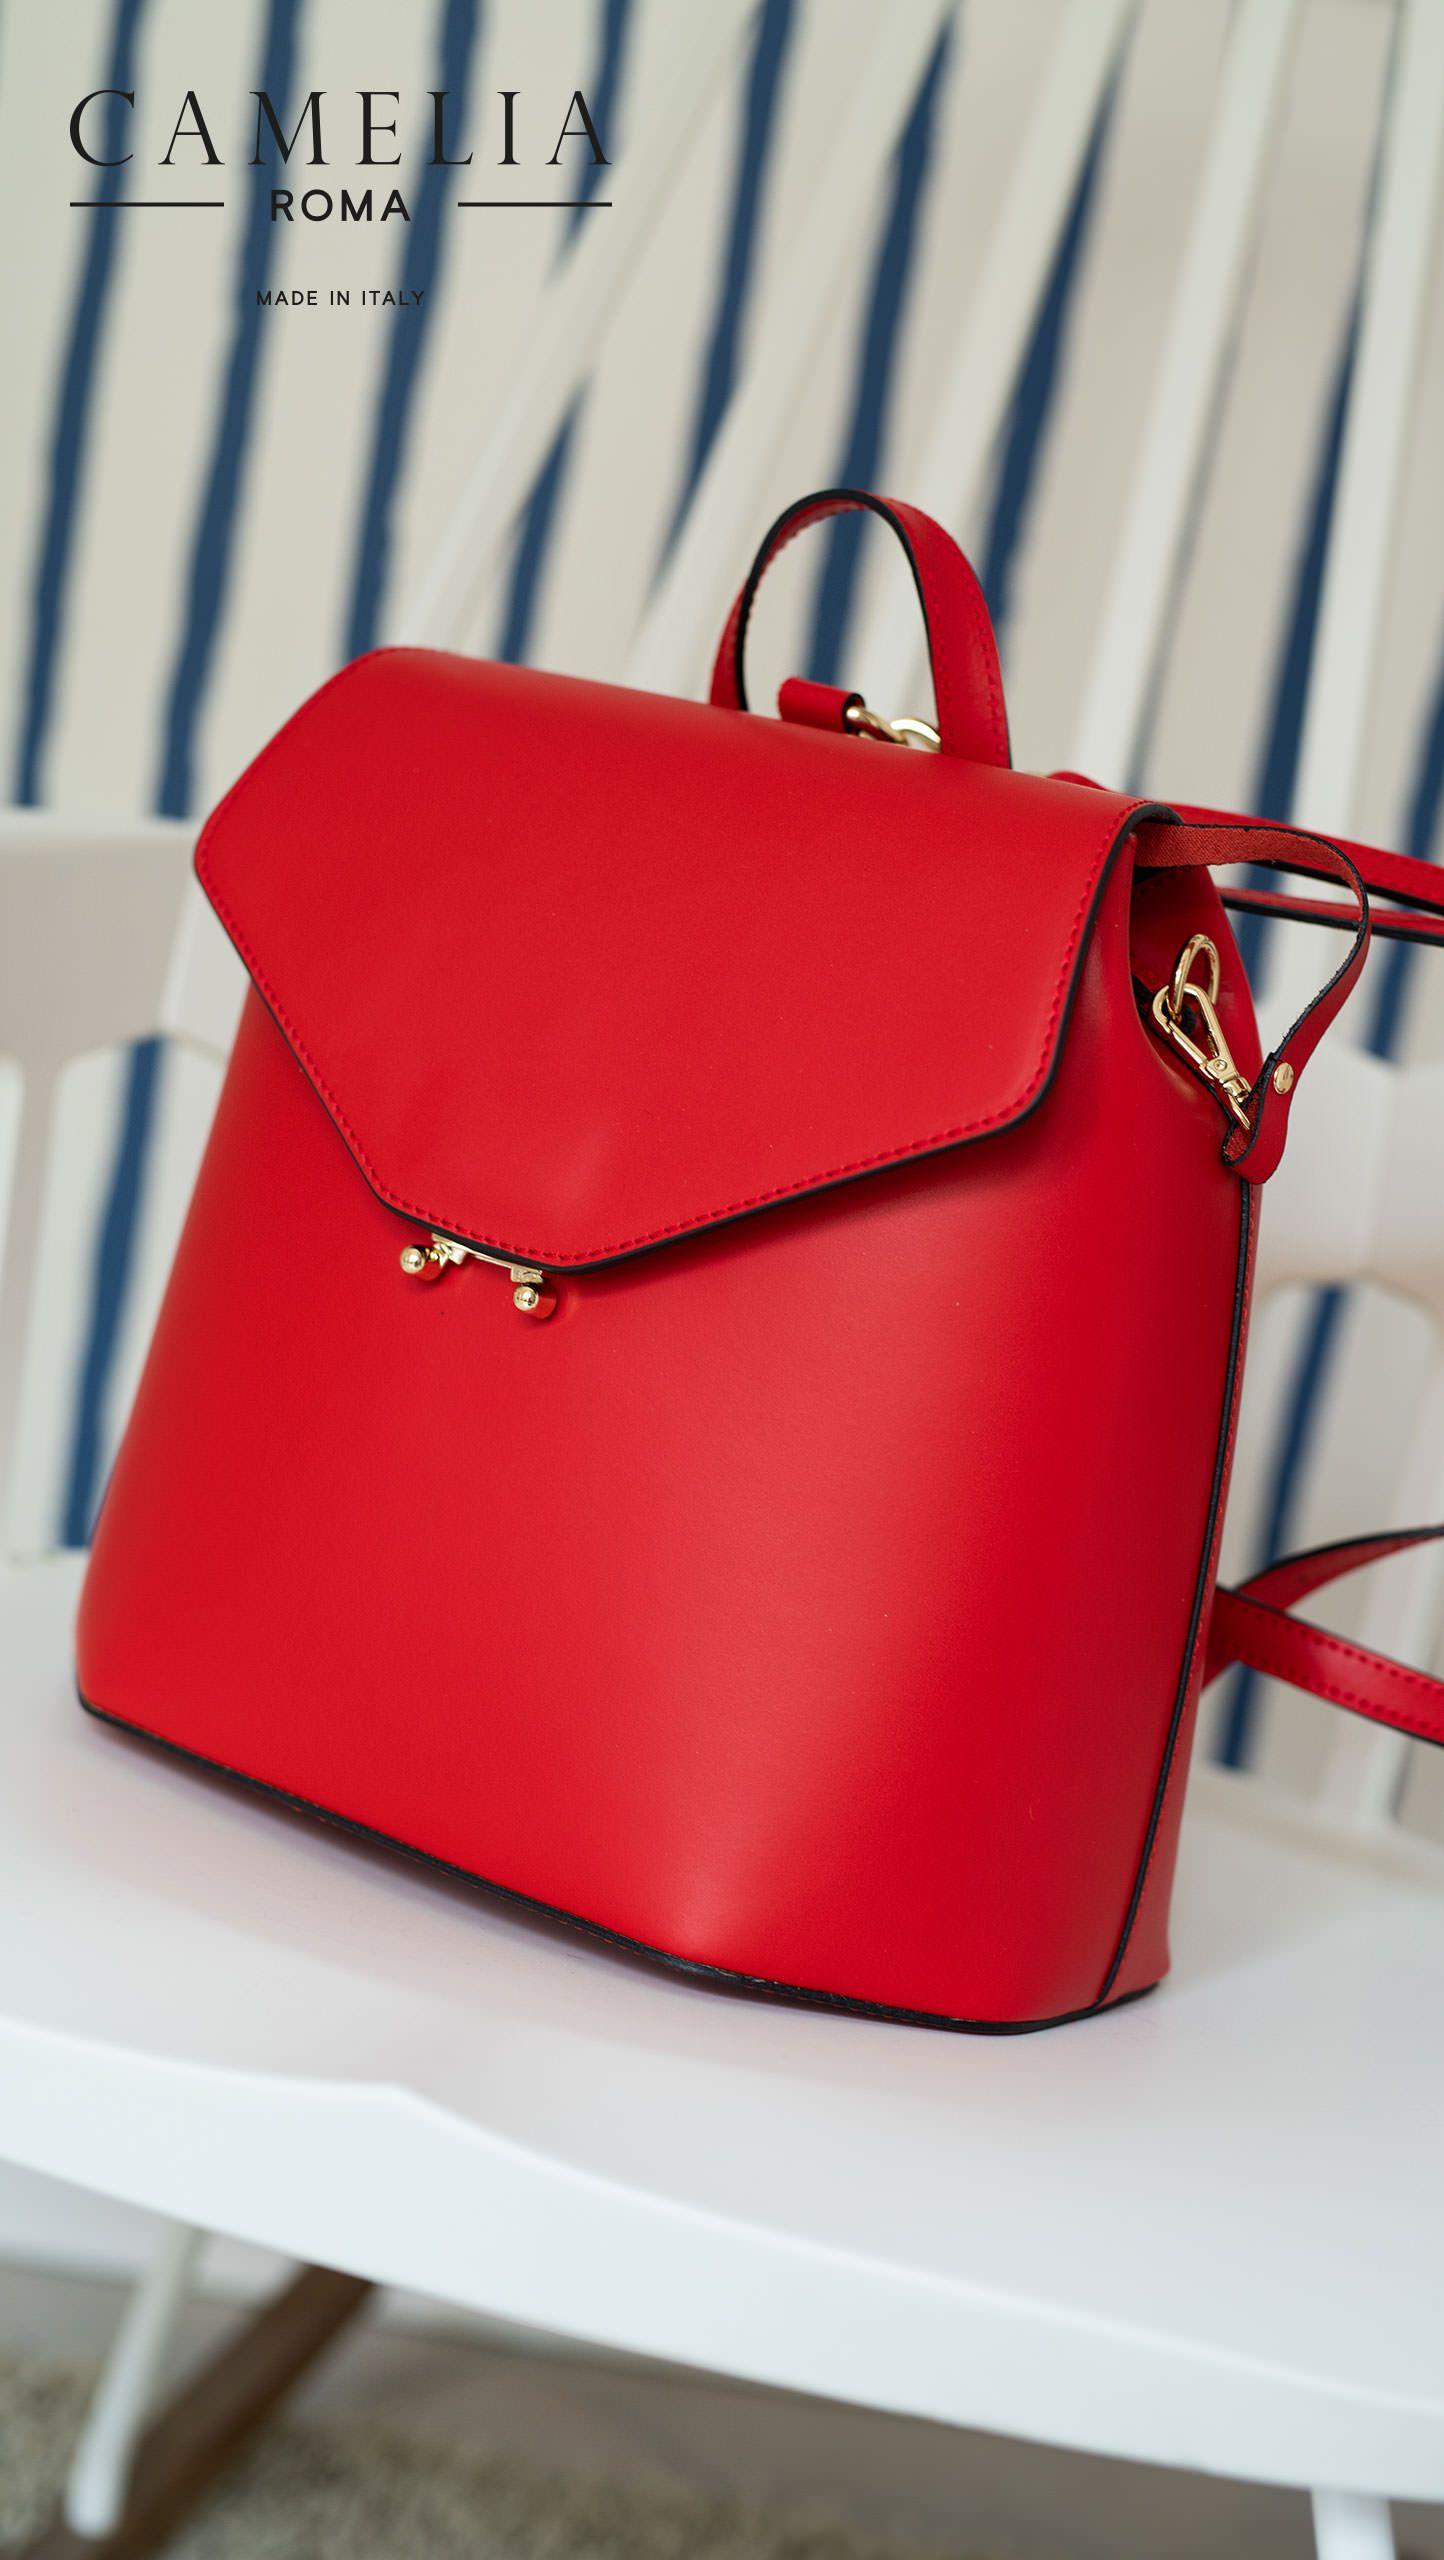 506cb807b9fcc Leather handbag - Camelia Roma